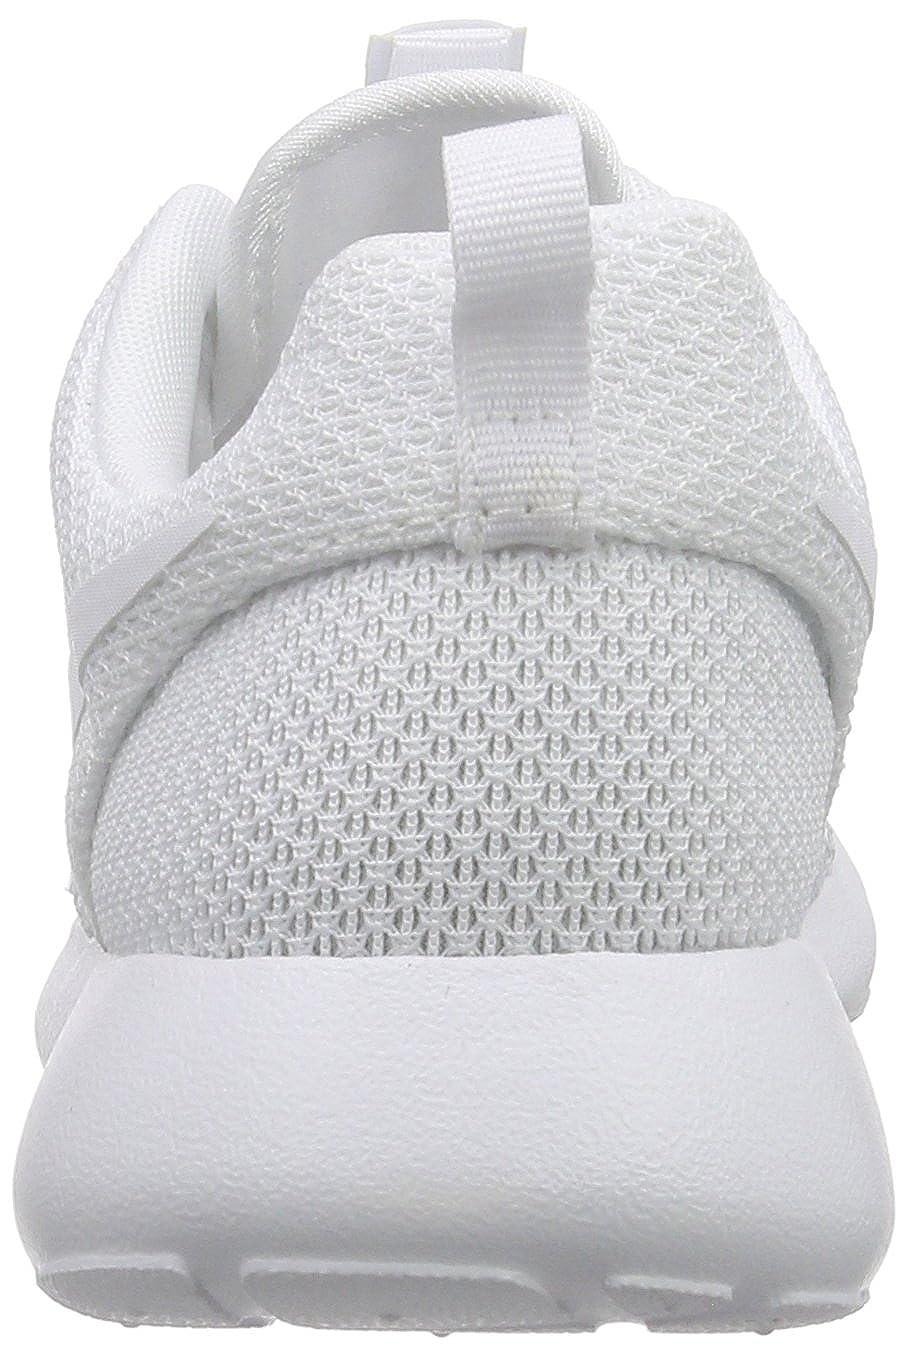 huge selection of 0056e 09e0d Amazon.com   Nike Men s Roshe Run   Fashion Sneakers